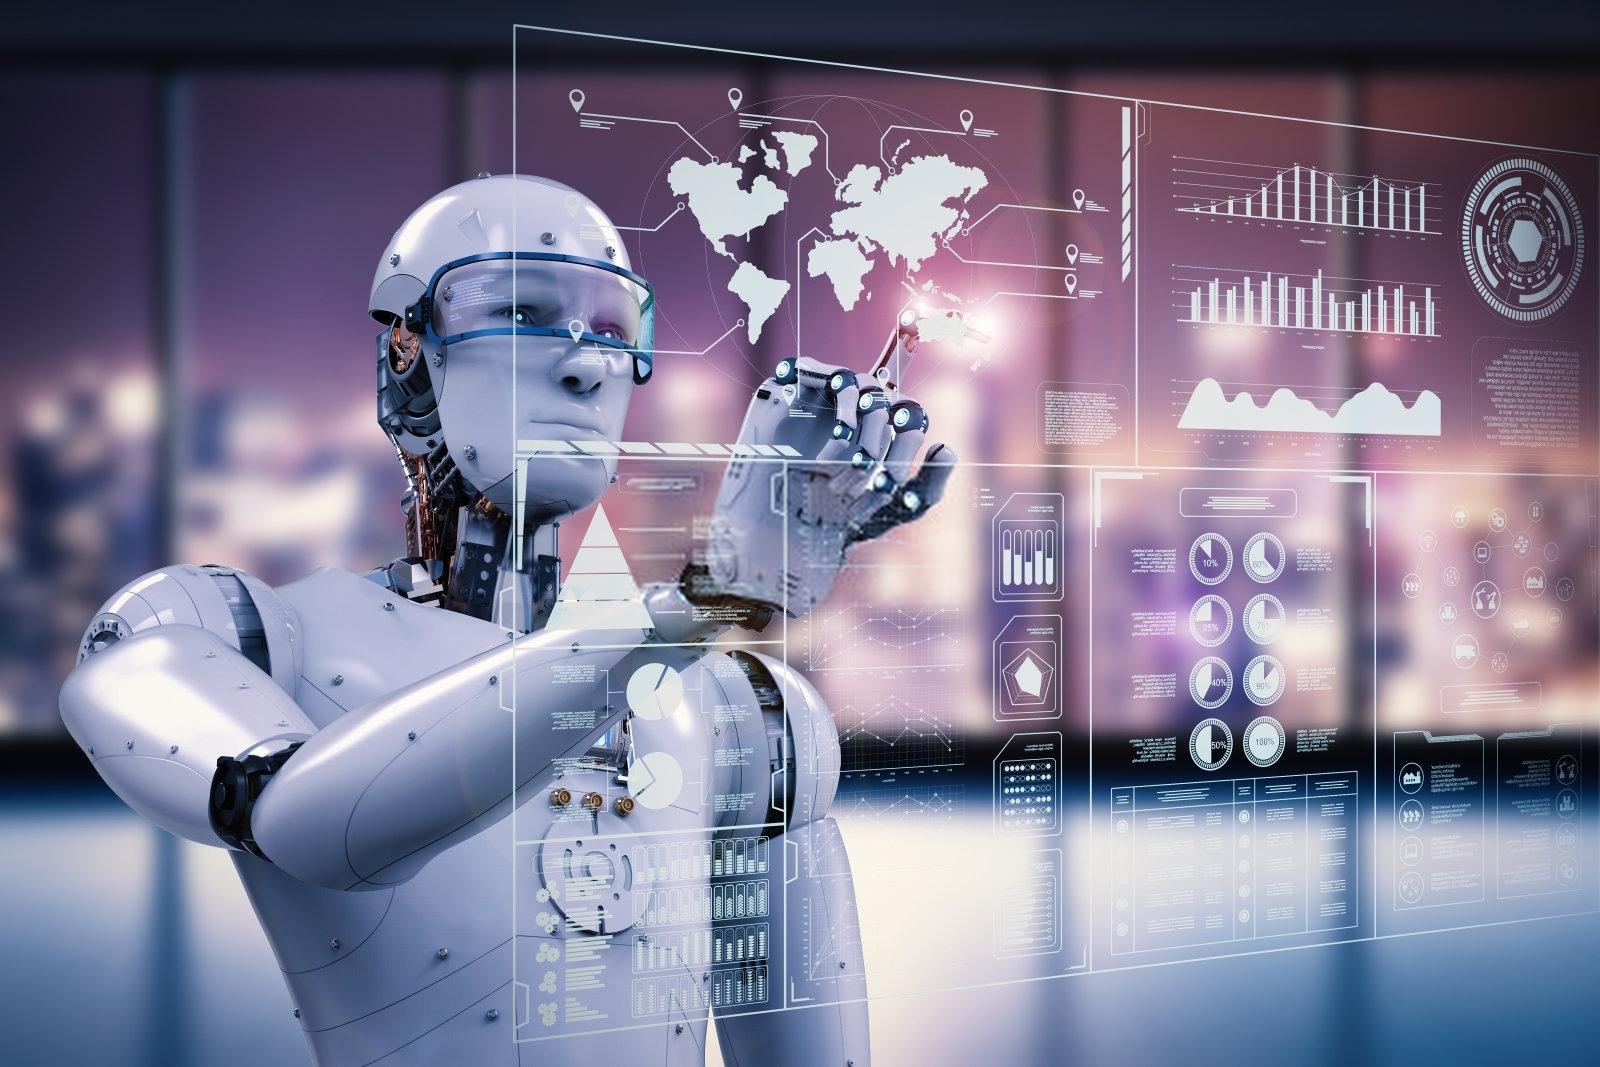 Human vs Machine: The Entrepreneur's Challenge